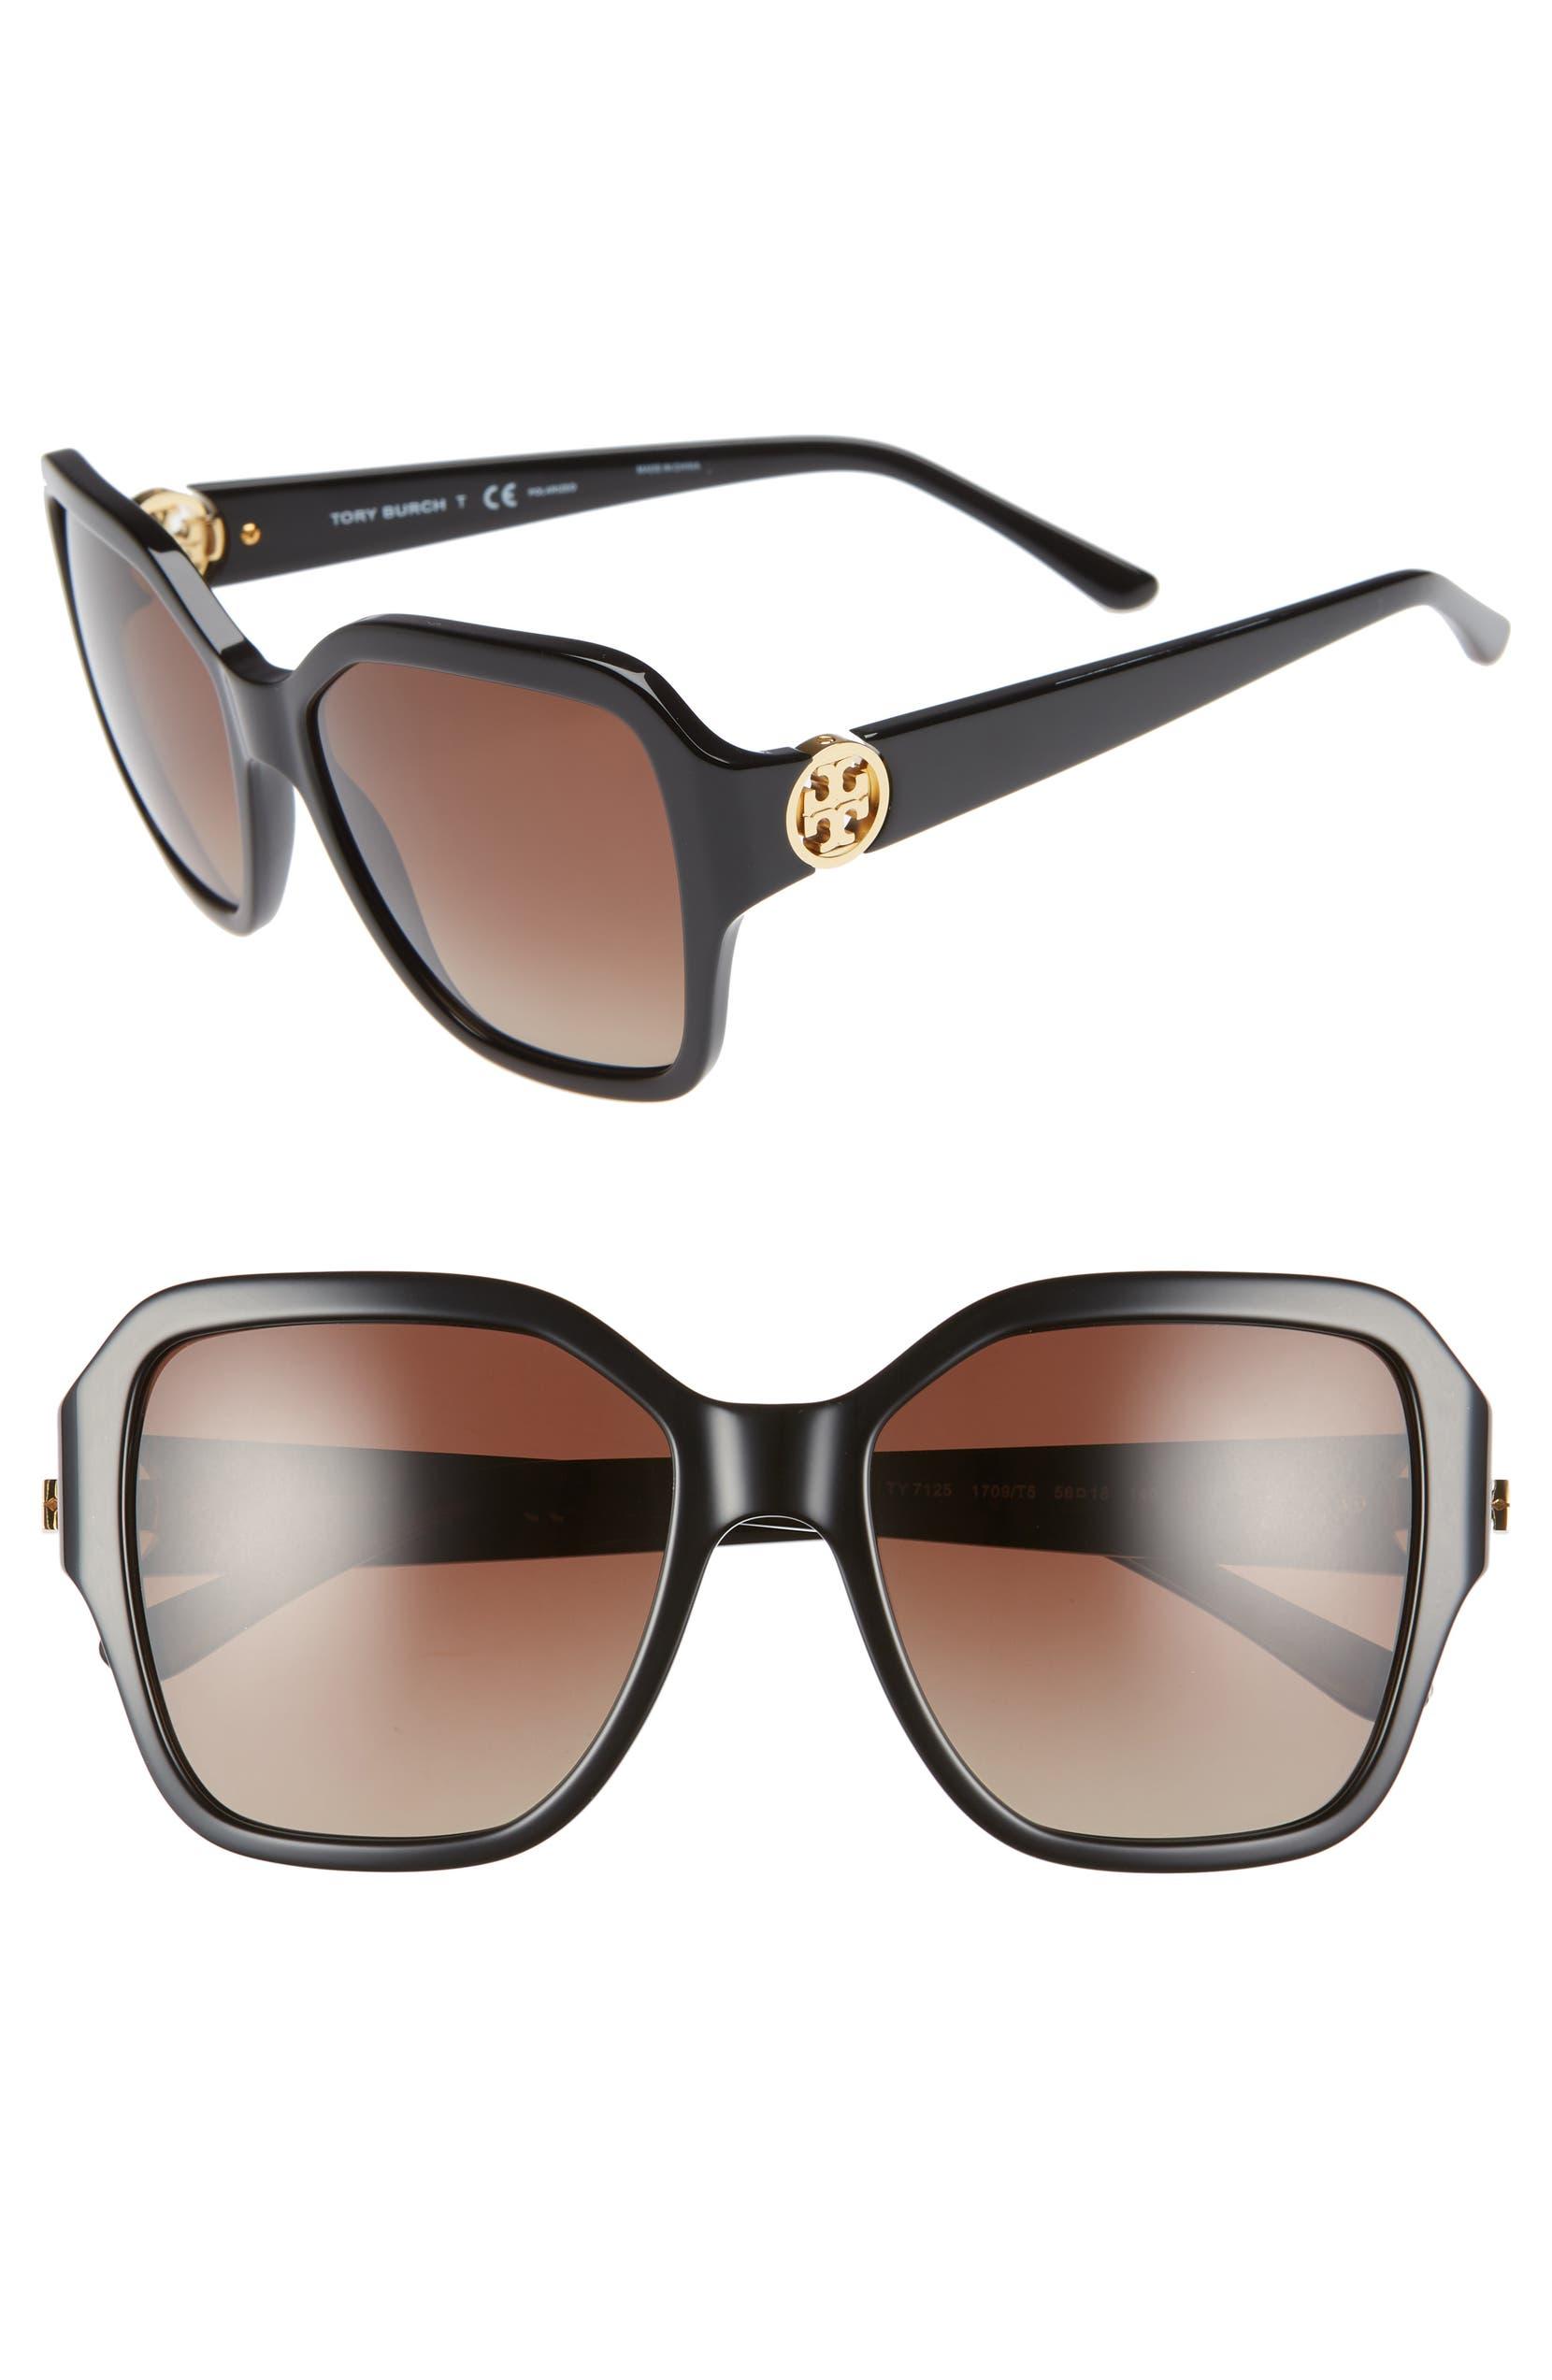 e43bd873cf Tory Burch Reva 56mm Polarized Square Sunglasses